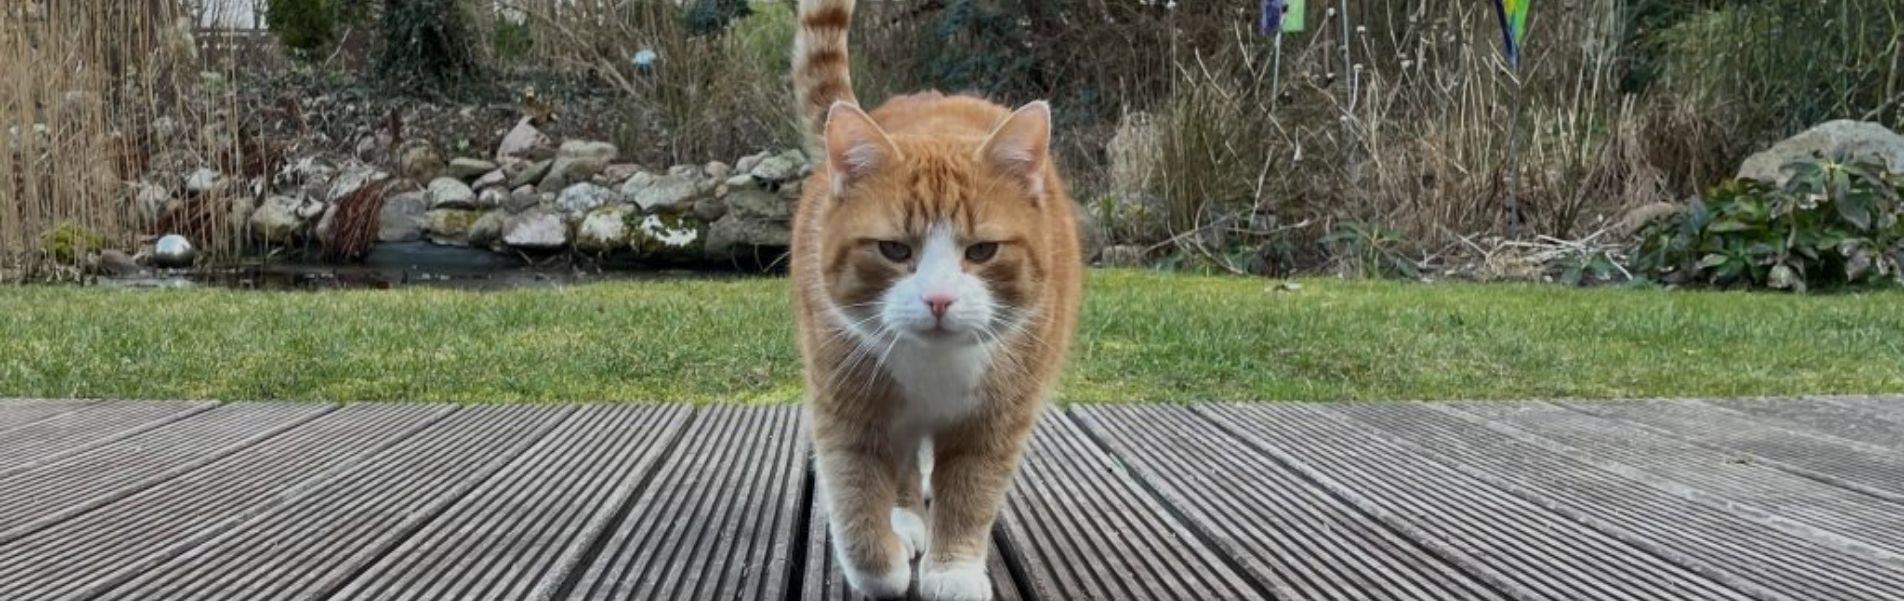 Anifit Katzenfutter – Das beste Katzenfutter 2021